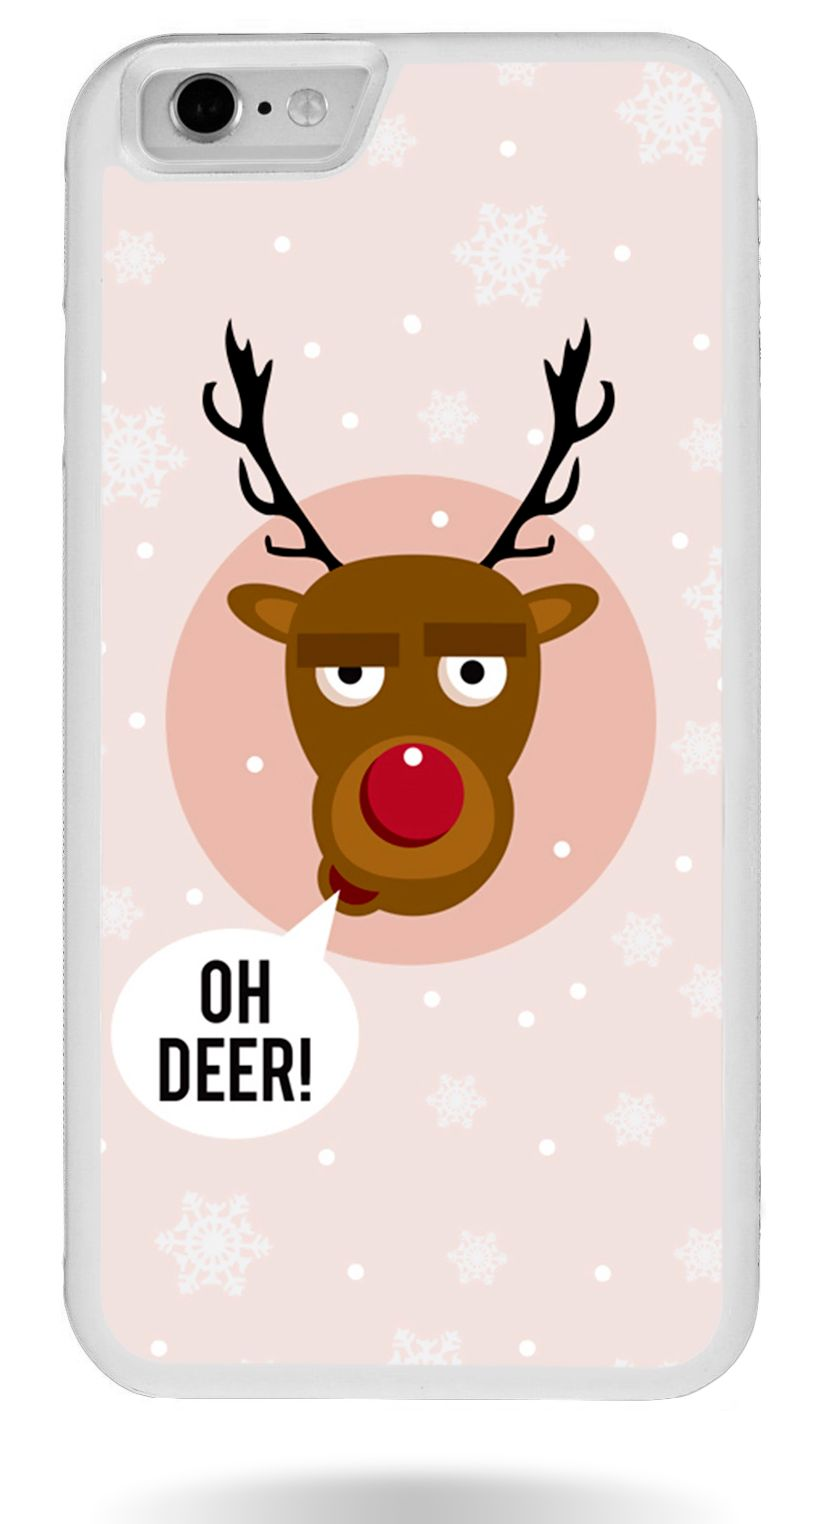 Чохол на Новий рік з Оленем для iPhone 6   6s Oh deer 1e18225a55b17